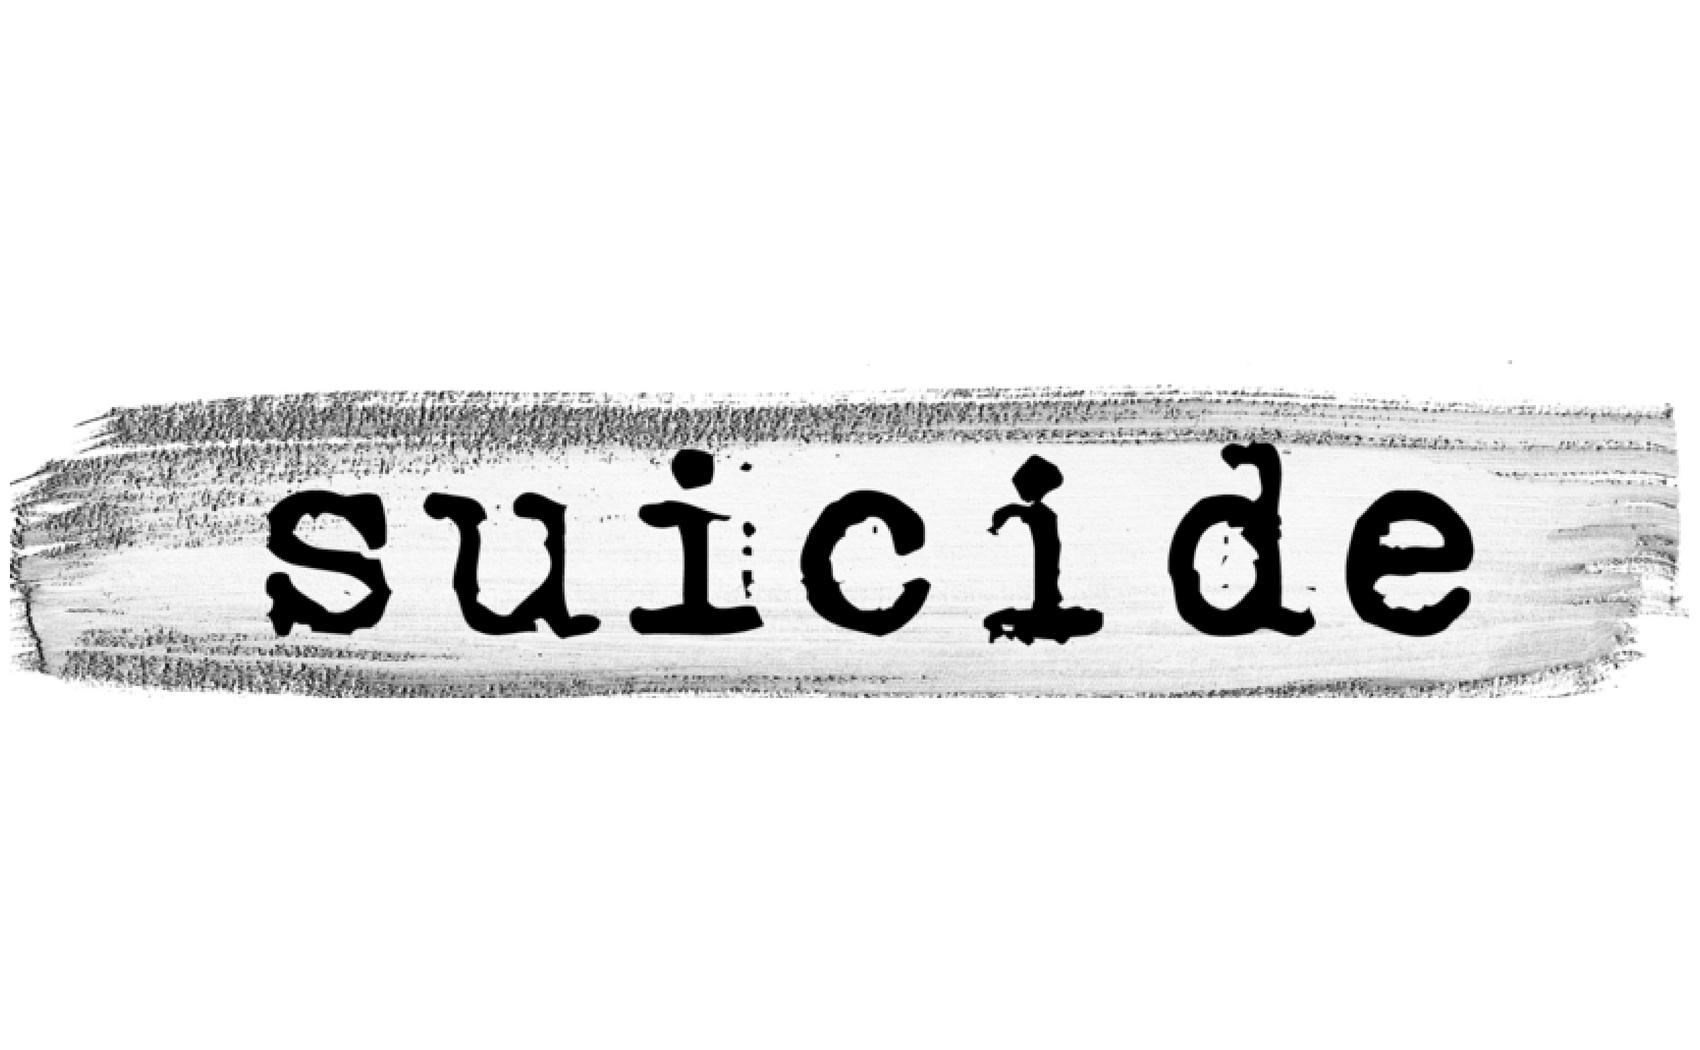 Police investigating apparent suicide